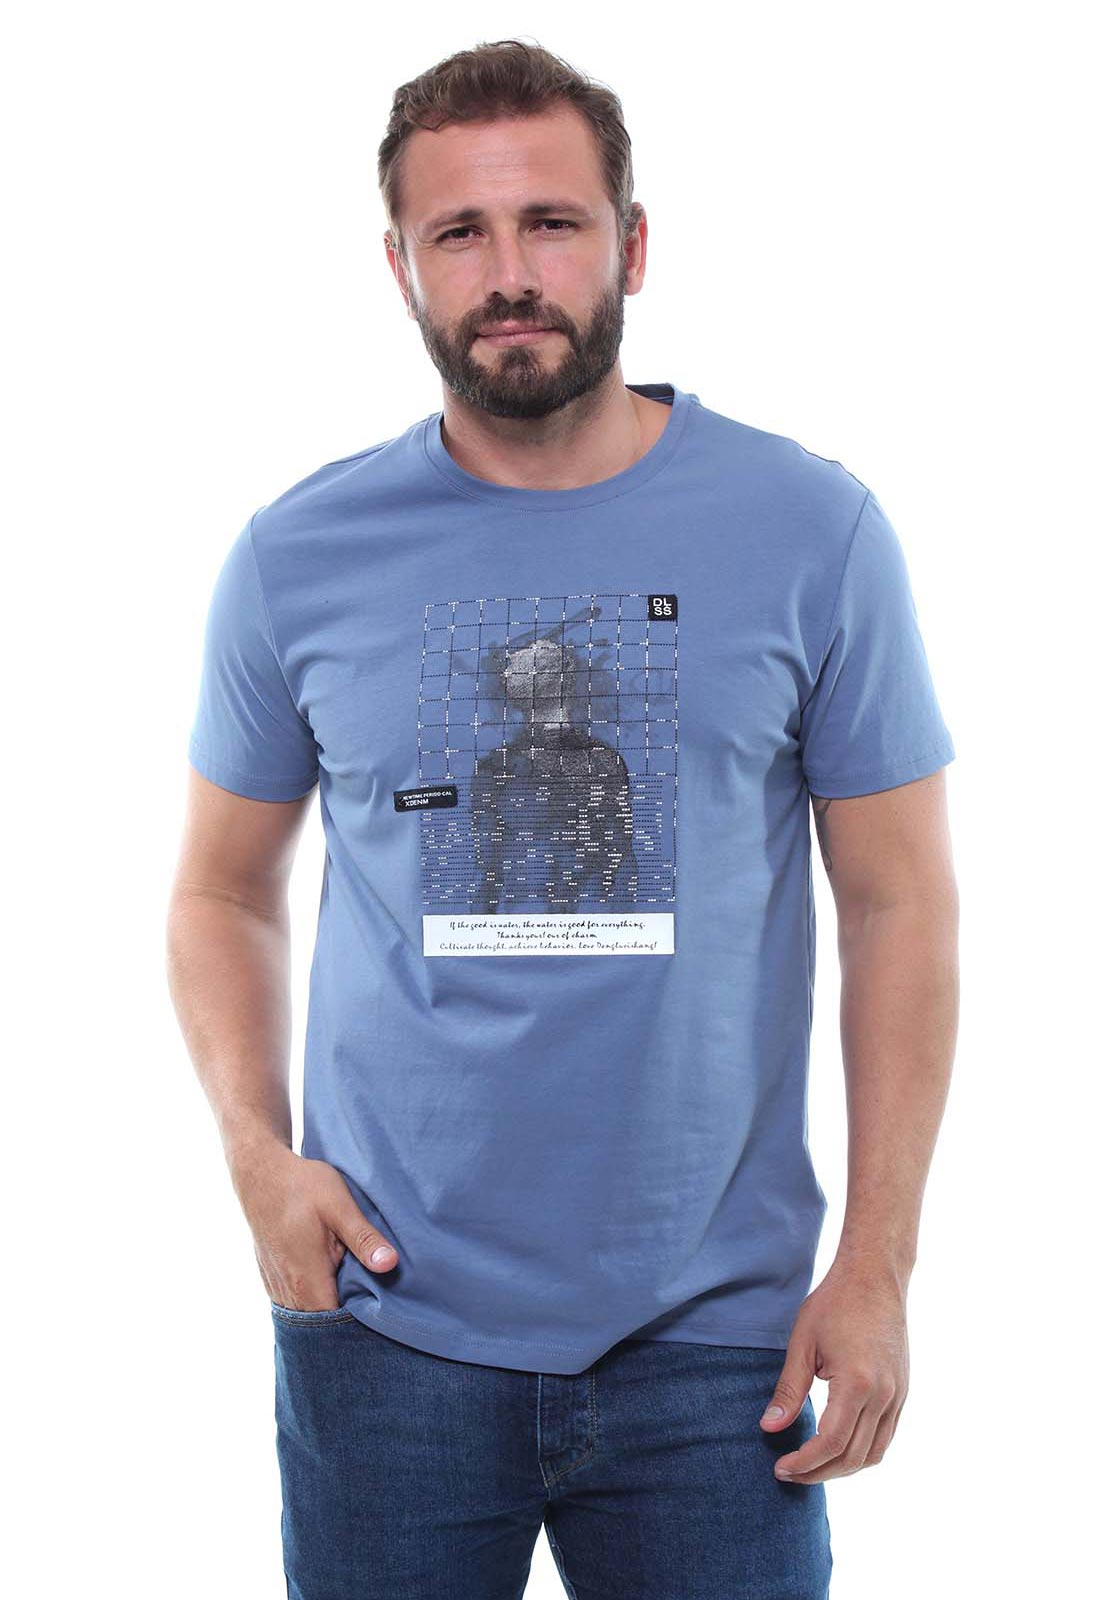 Camiseta Masculina Manga Curta Crocker - 47849  - CROCKER JEANS